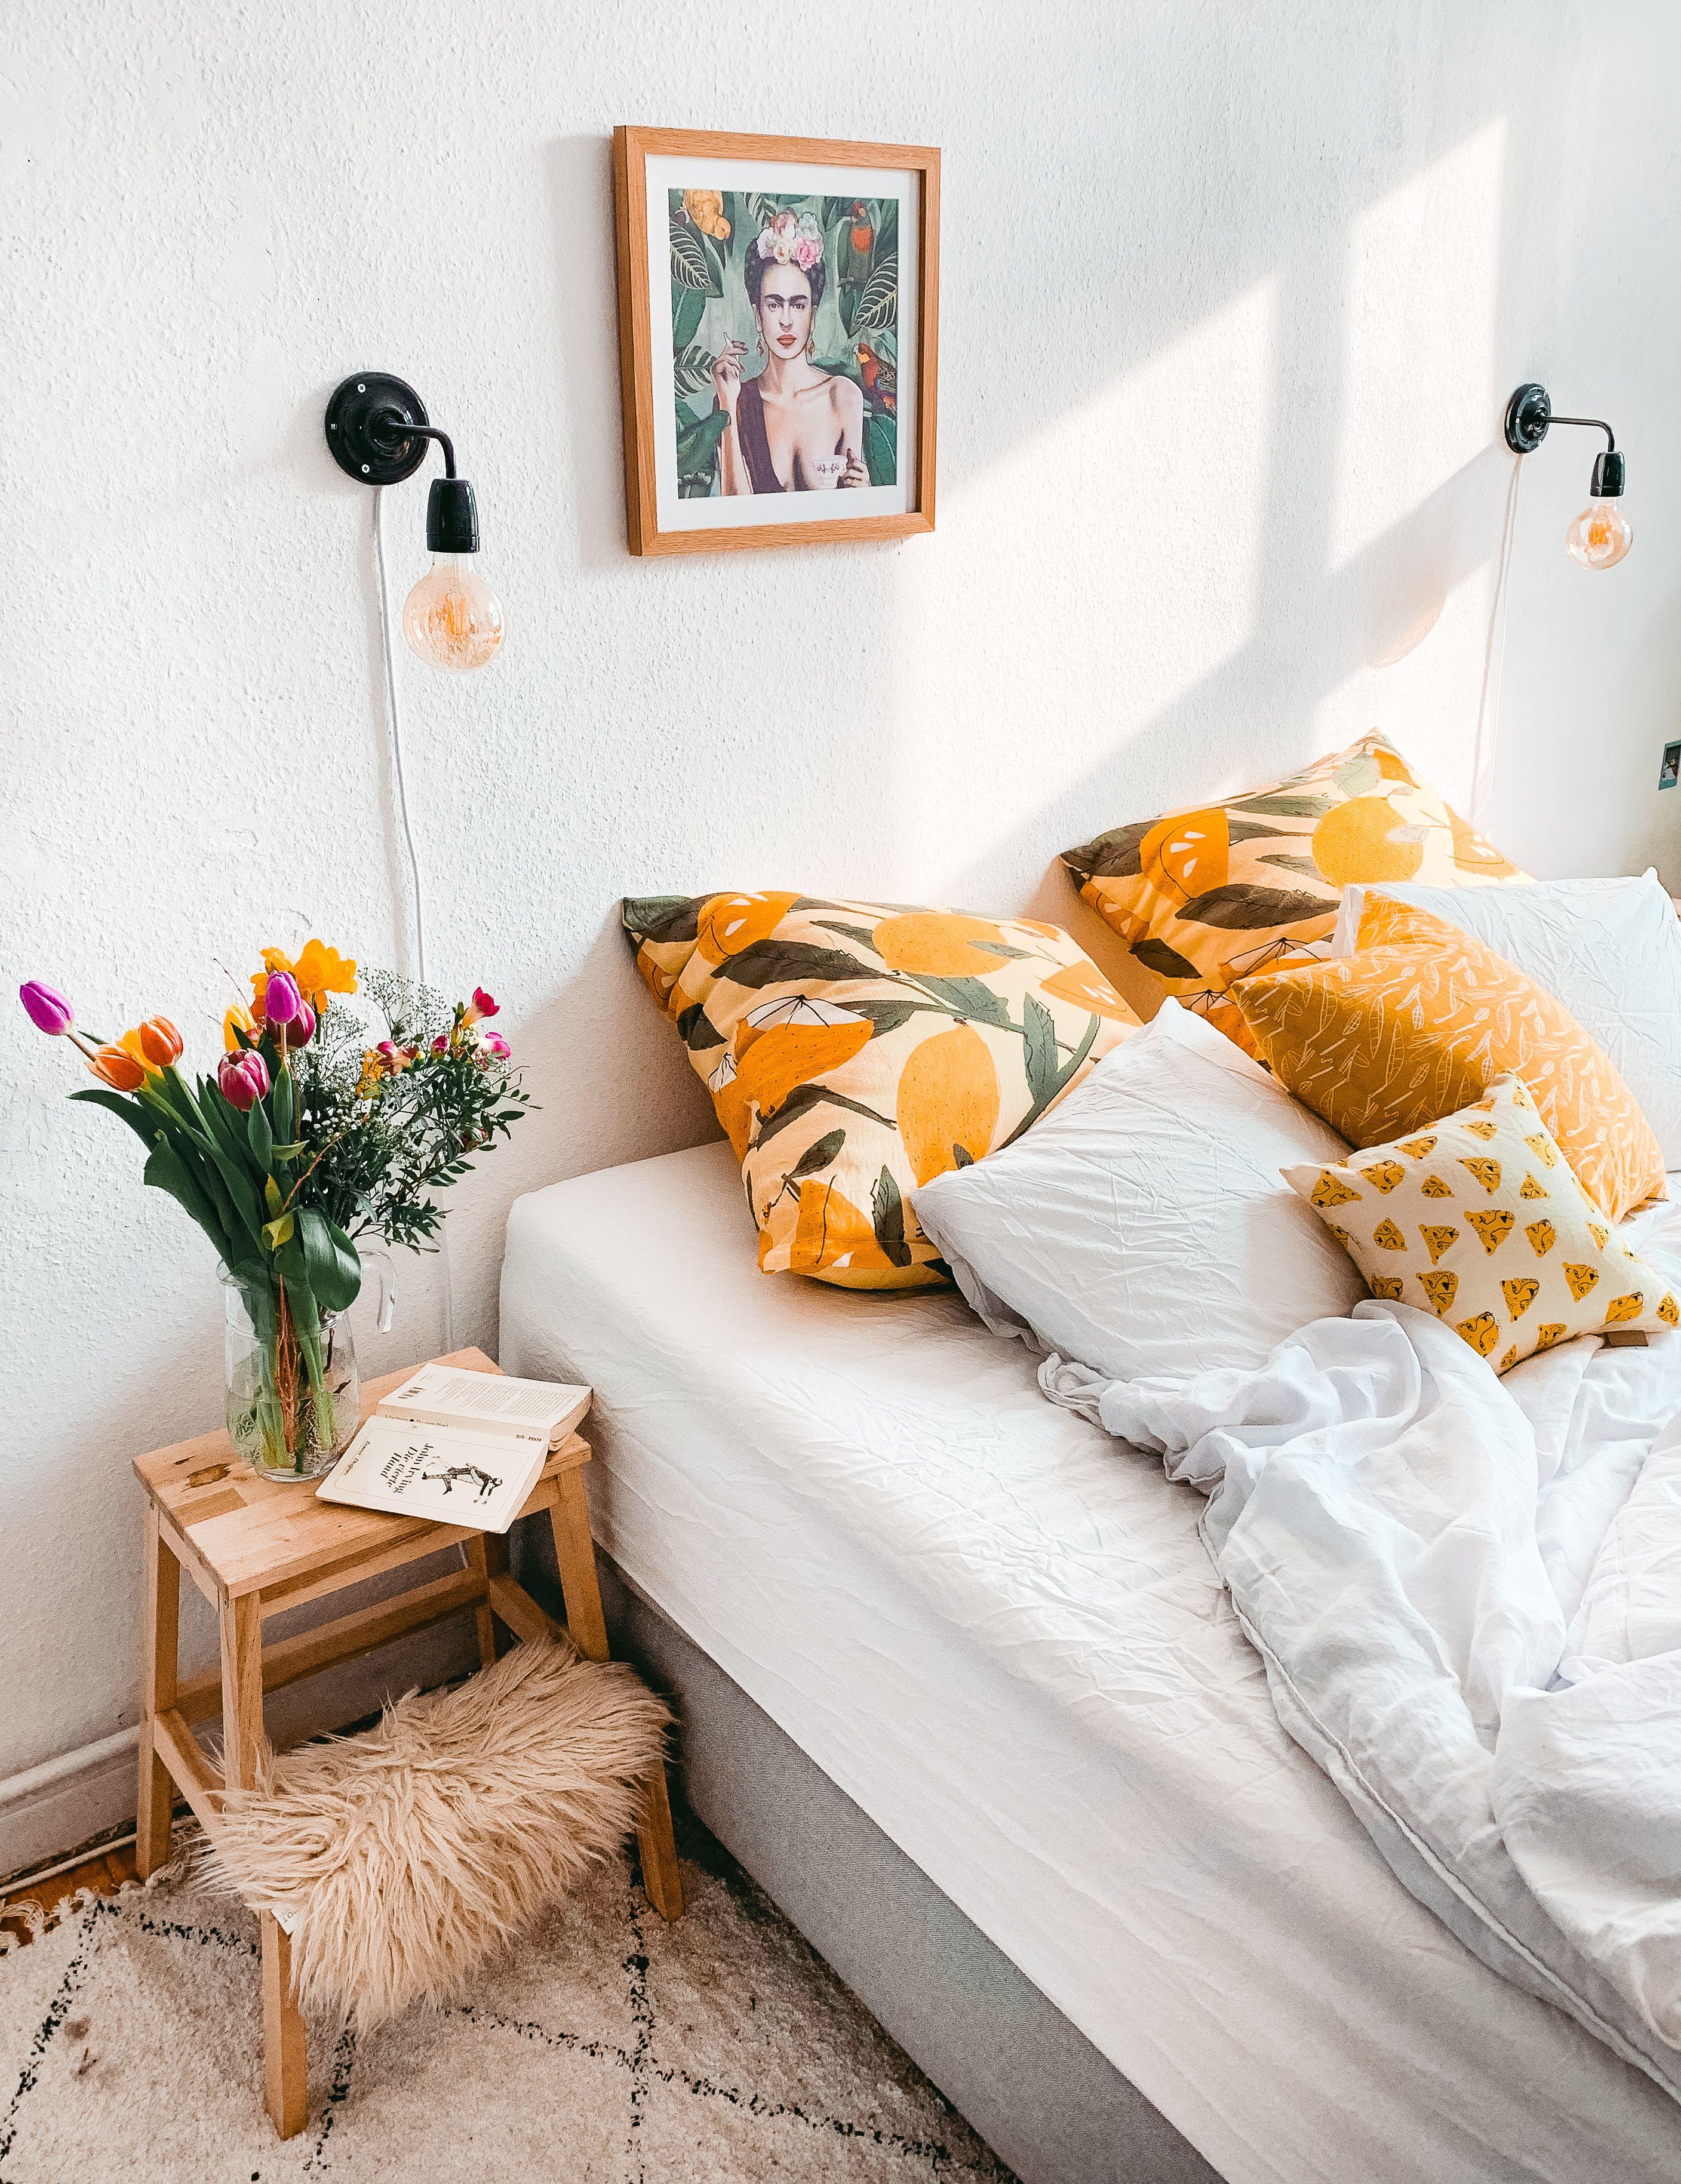 Decoration Tips for Feel-Good Living –